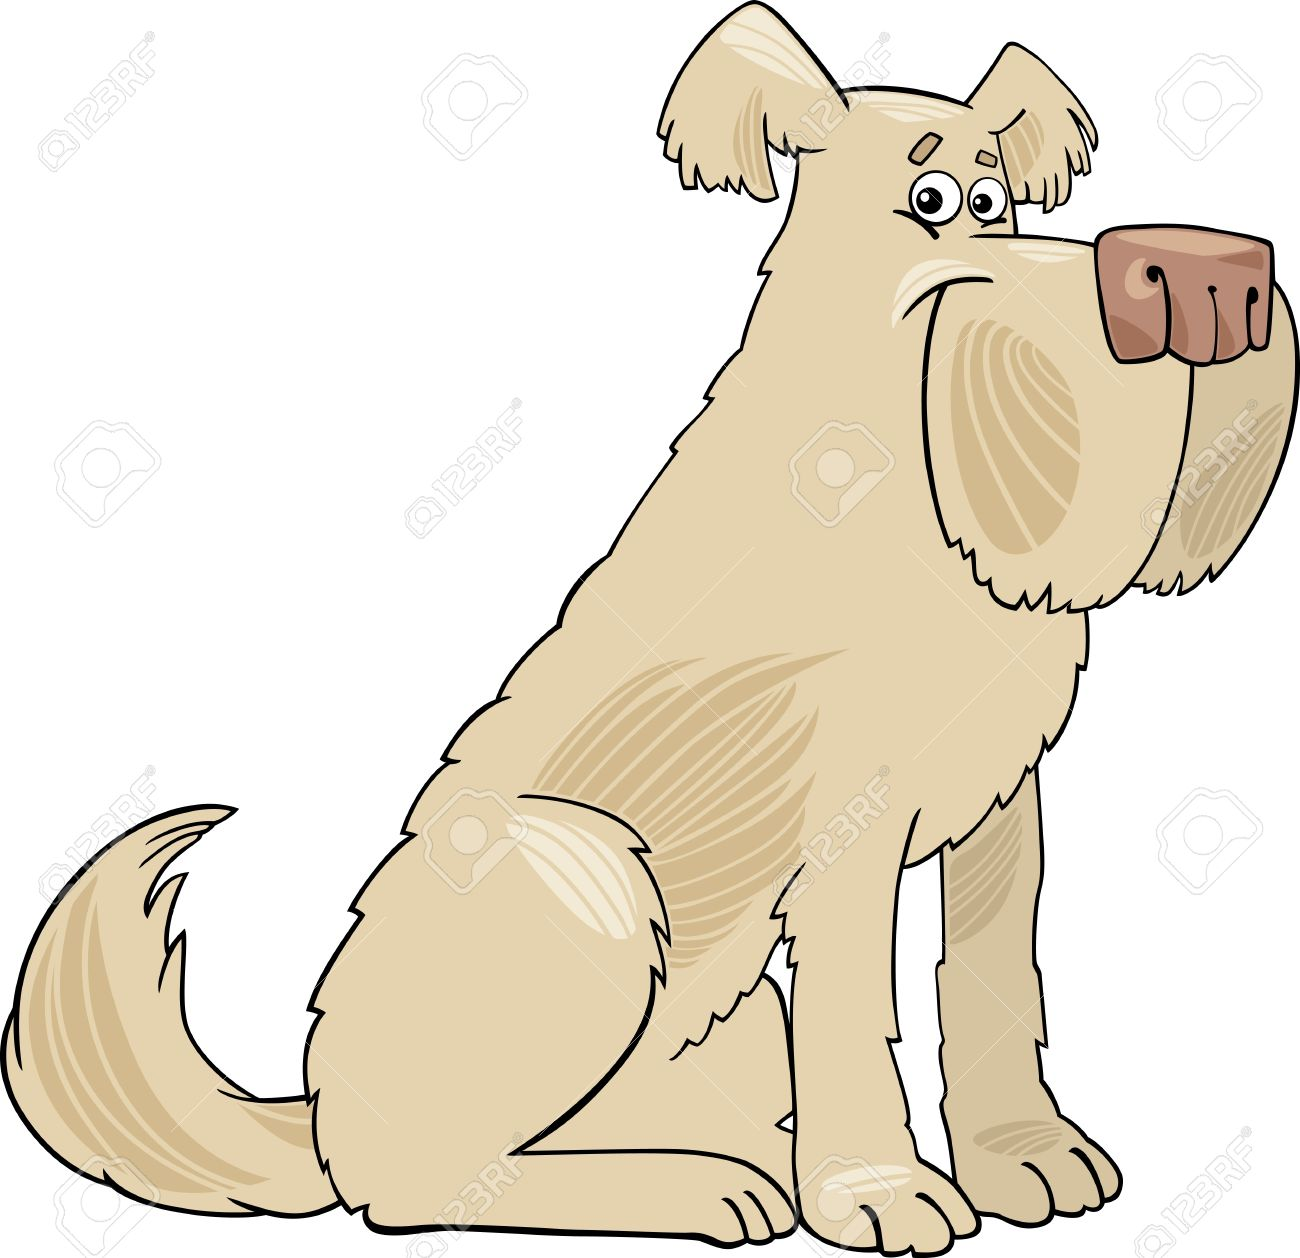 Cartoon Illustration of Funny Shaggy Beige Sheepdog Dog Stock Vector - 16789725